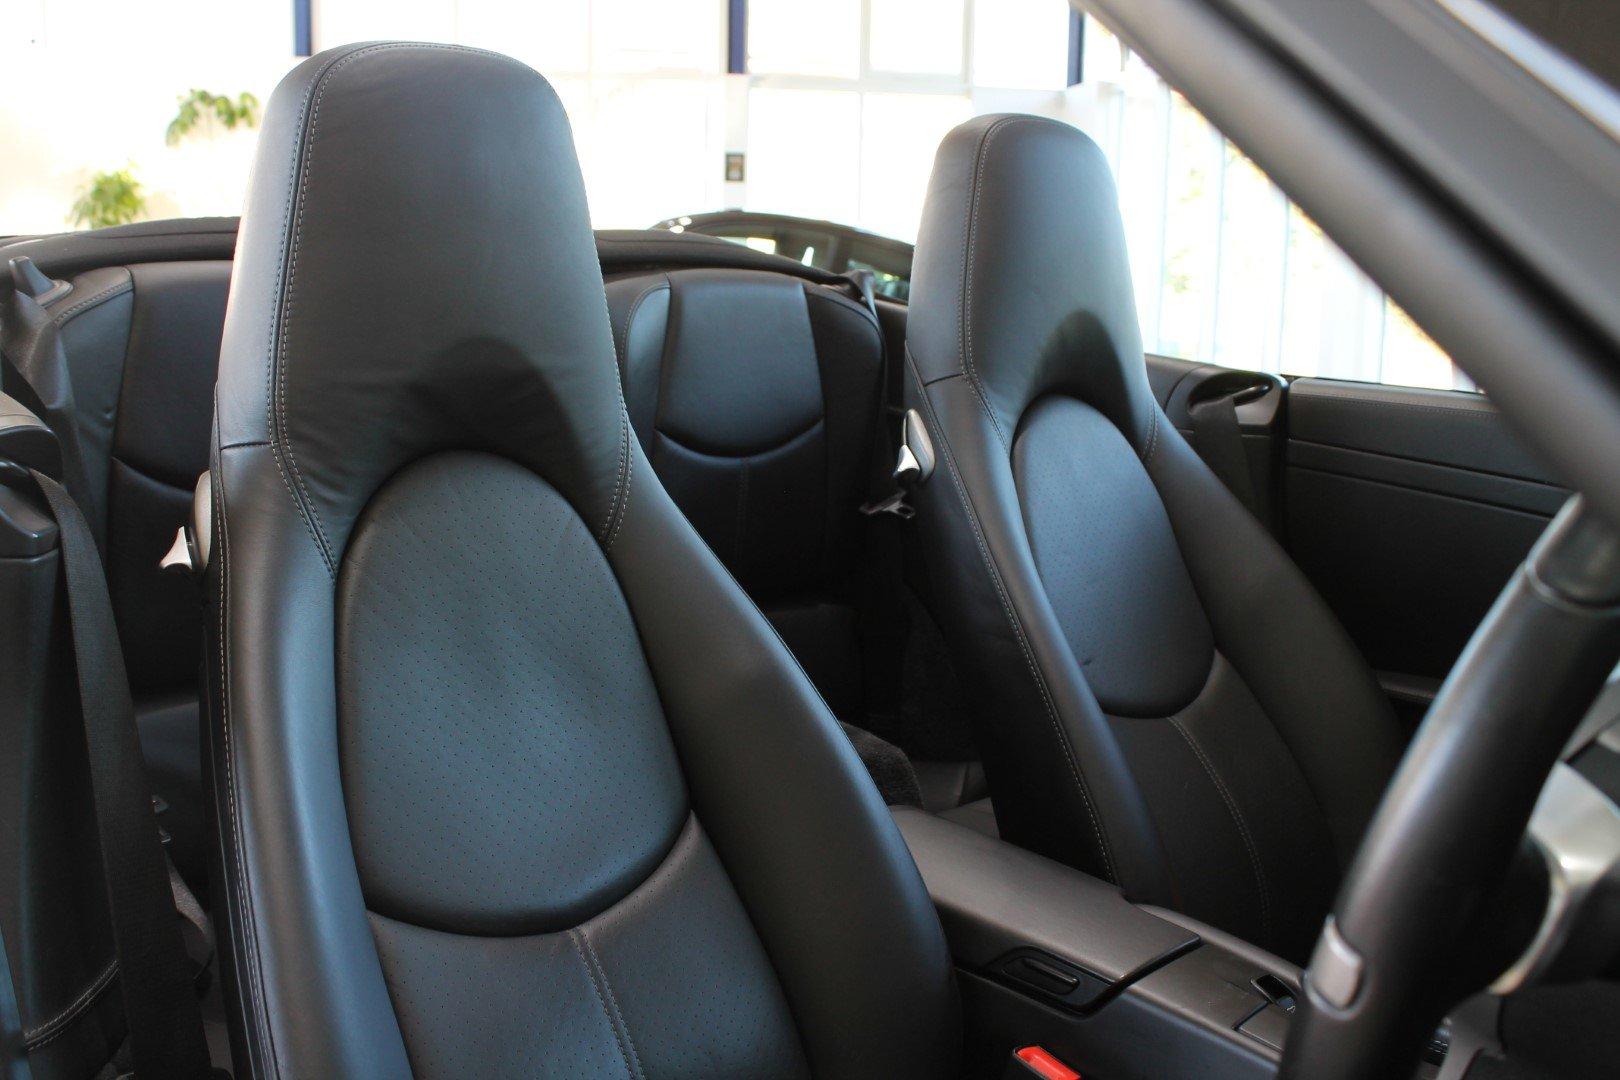 2009 Porsche 911 (997) 3.8 C4S PDK Cabriolet For Sale (picture 6 of 6)